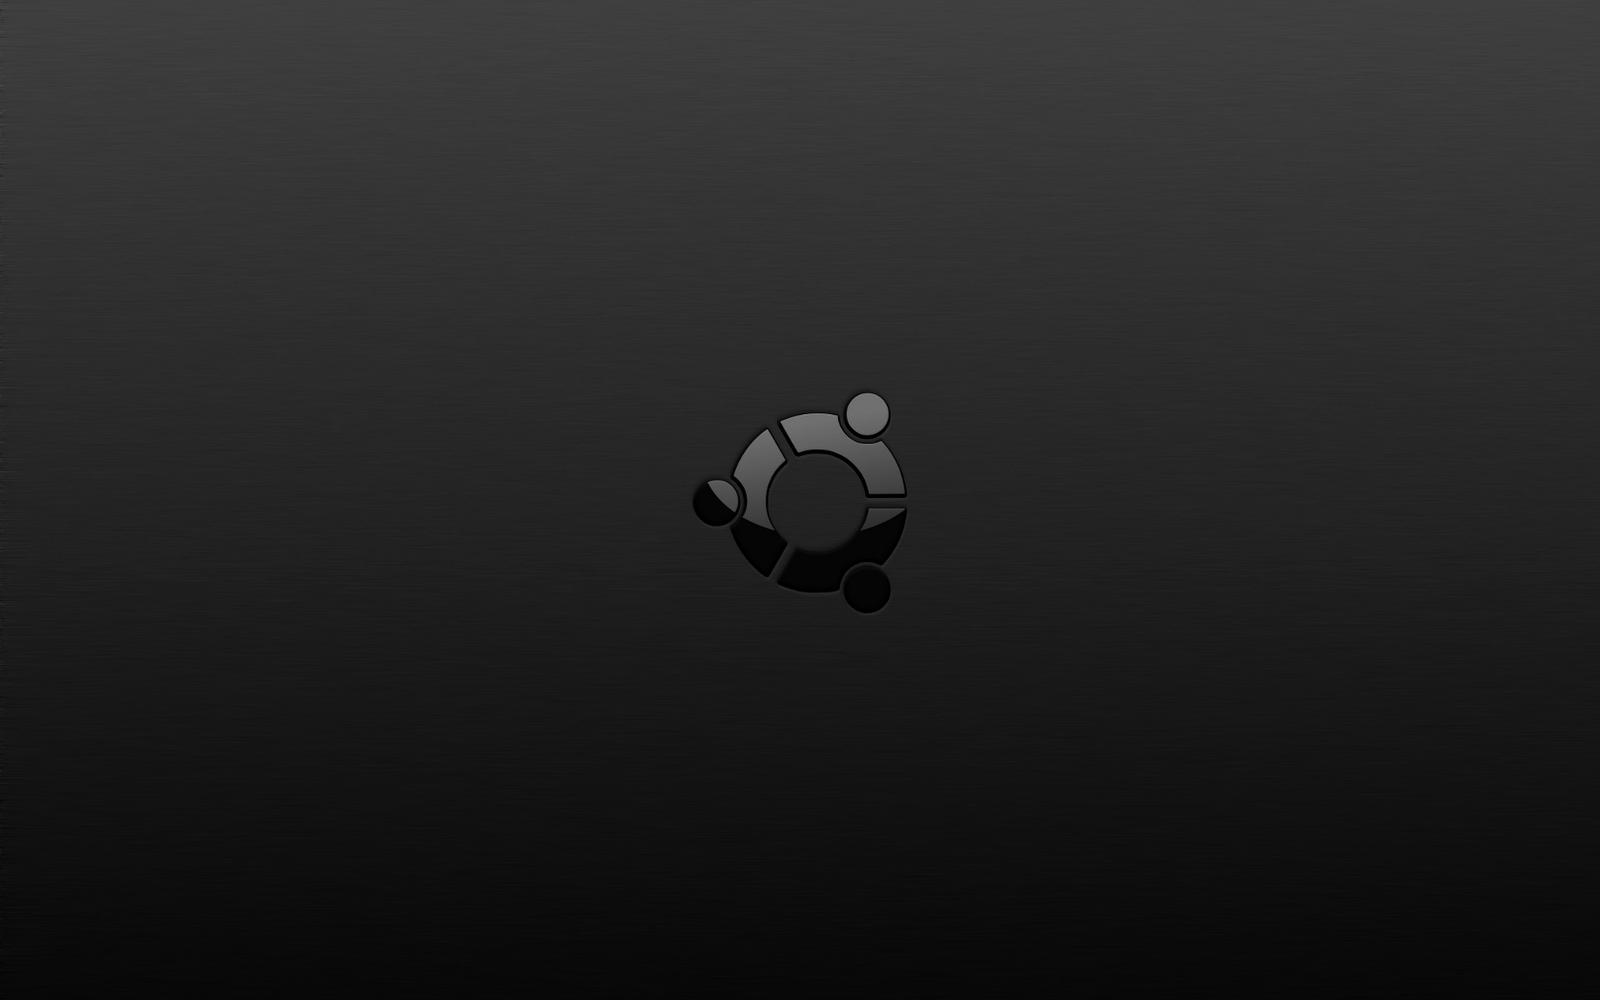 Ubuntu HD Desktop Wallpaper Download Wallpapers in HD for your 1600x1000